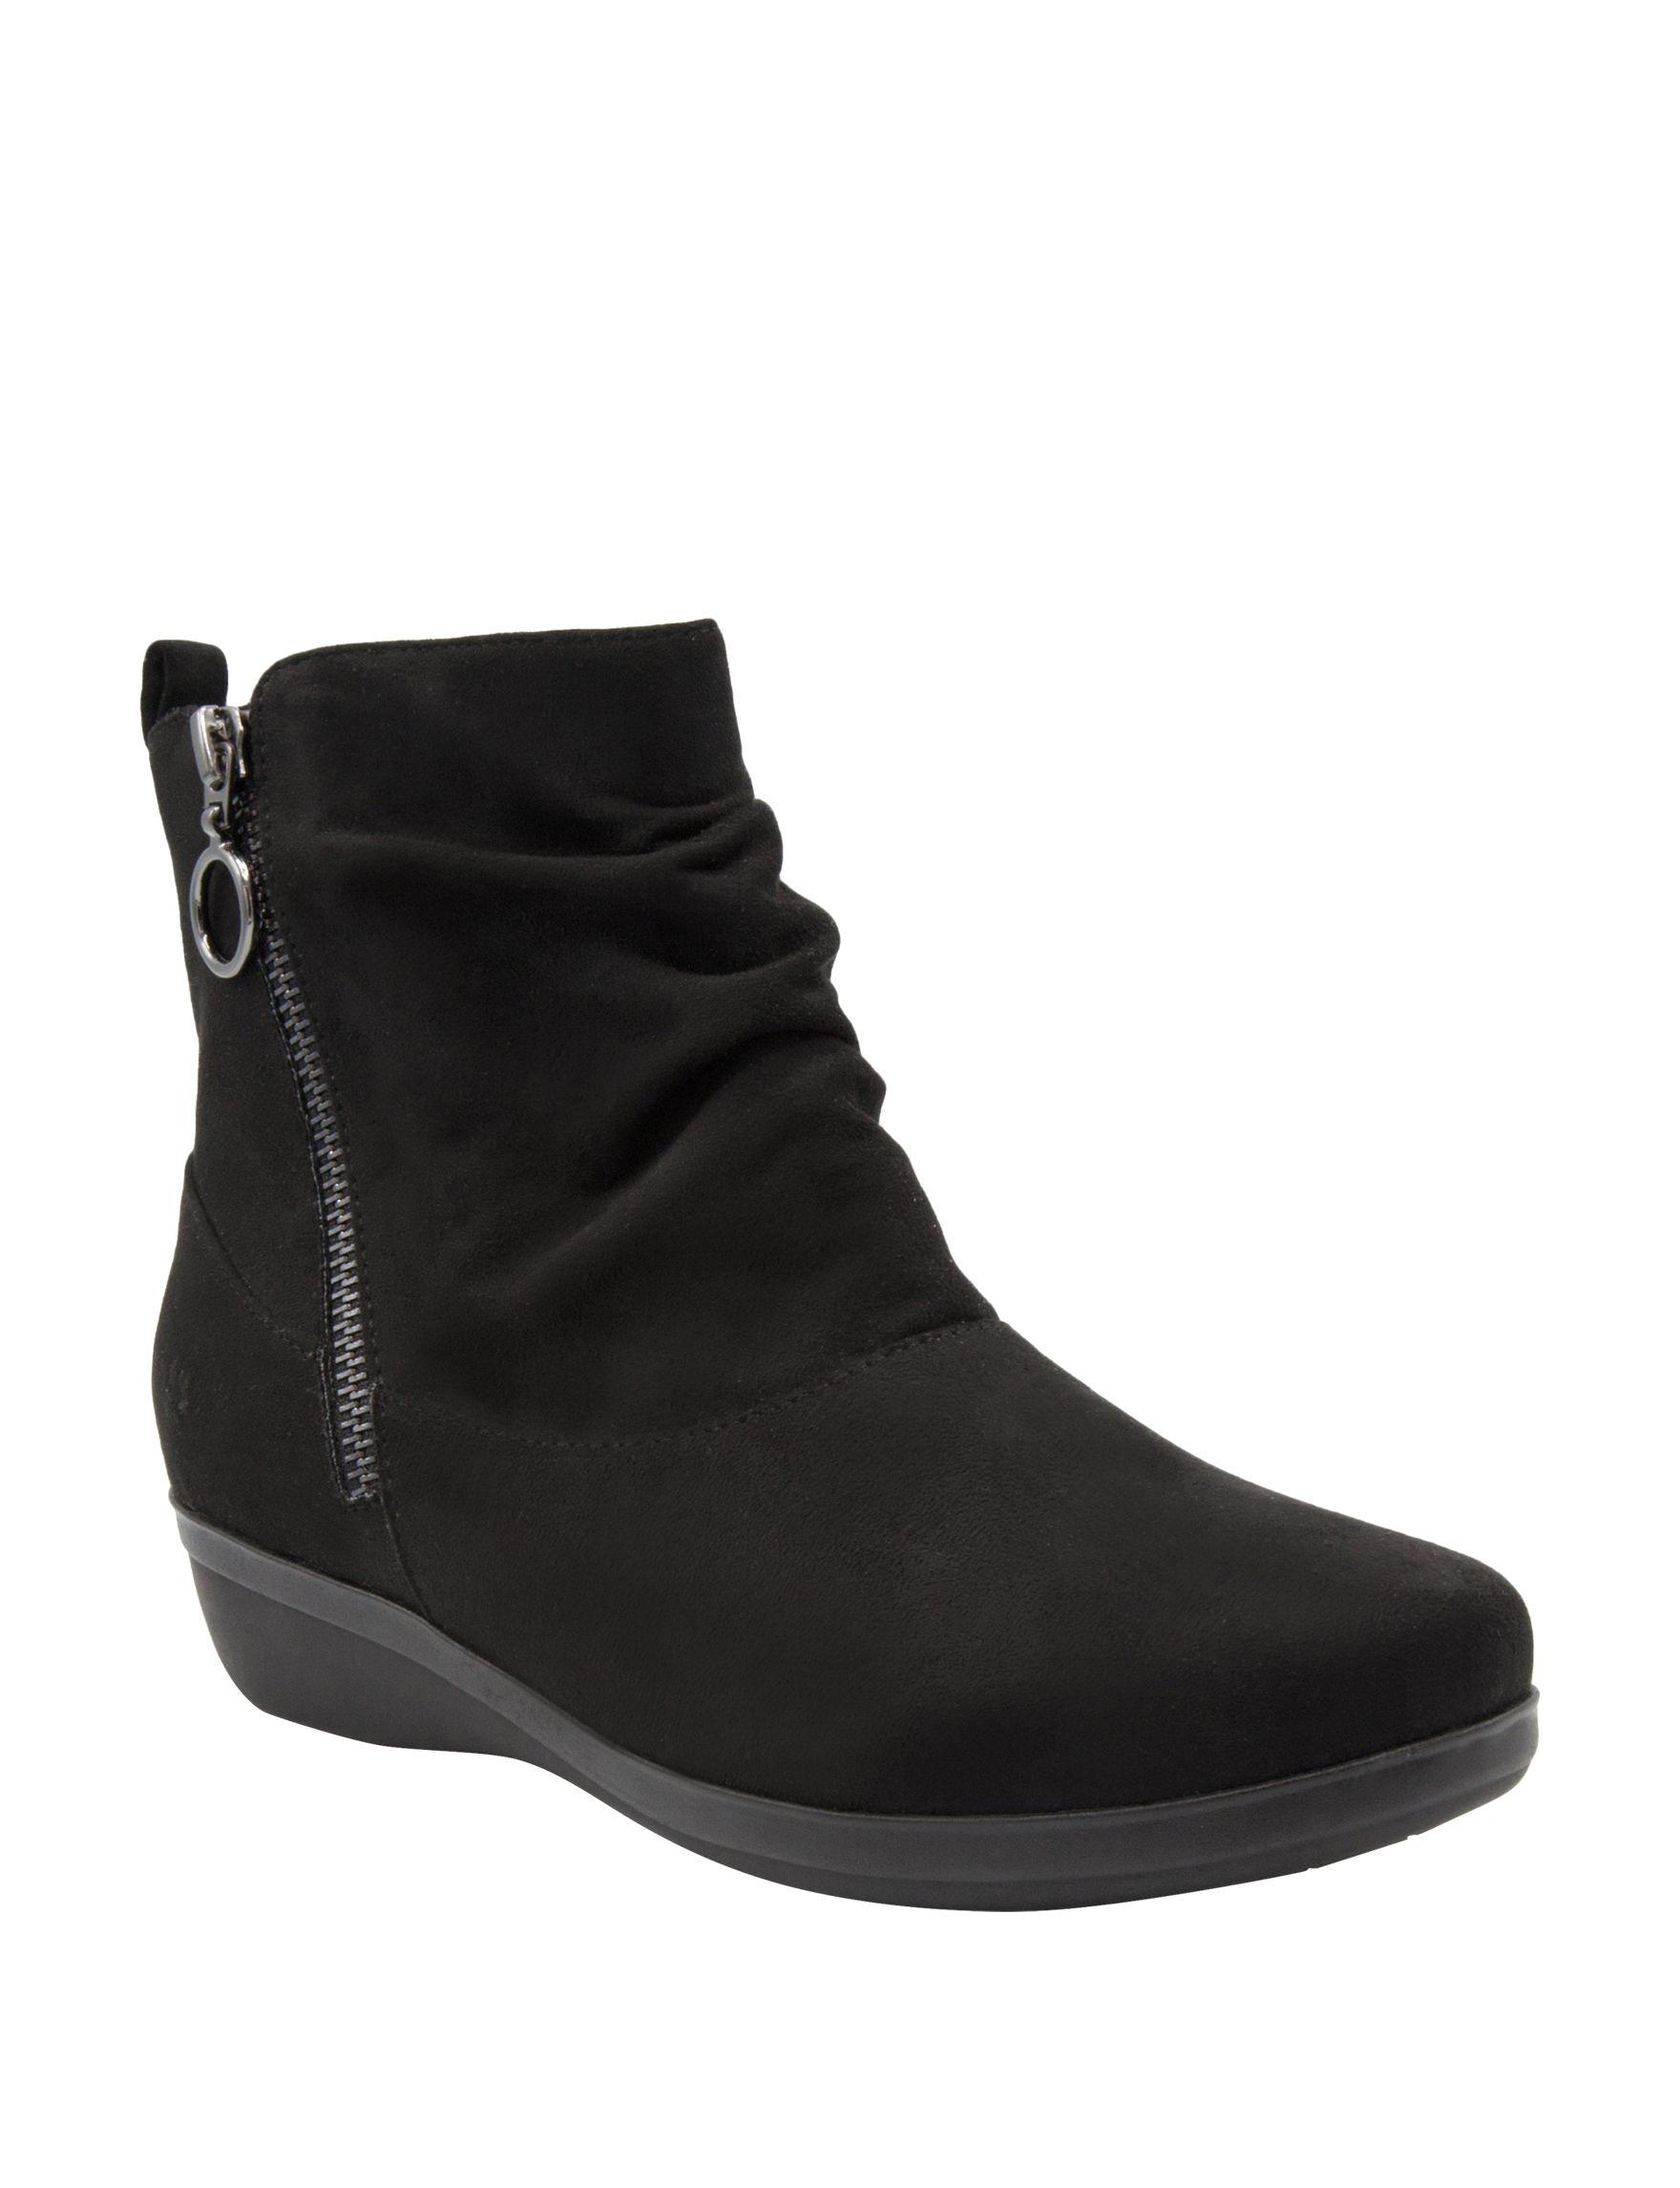 Gloria Vanderbilt Black Wedge Boots